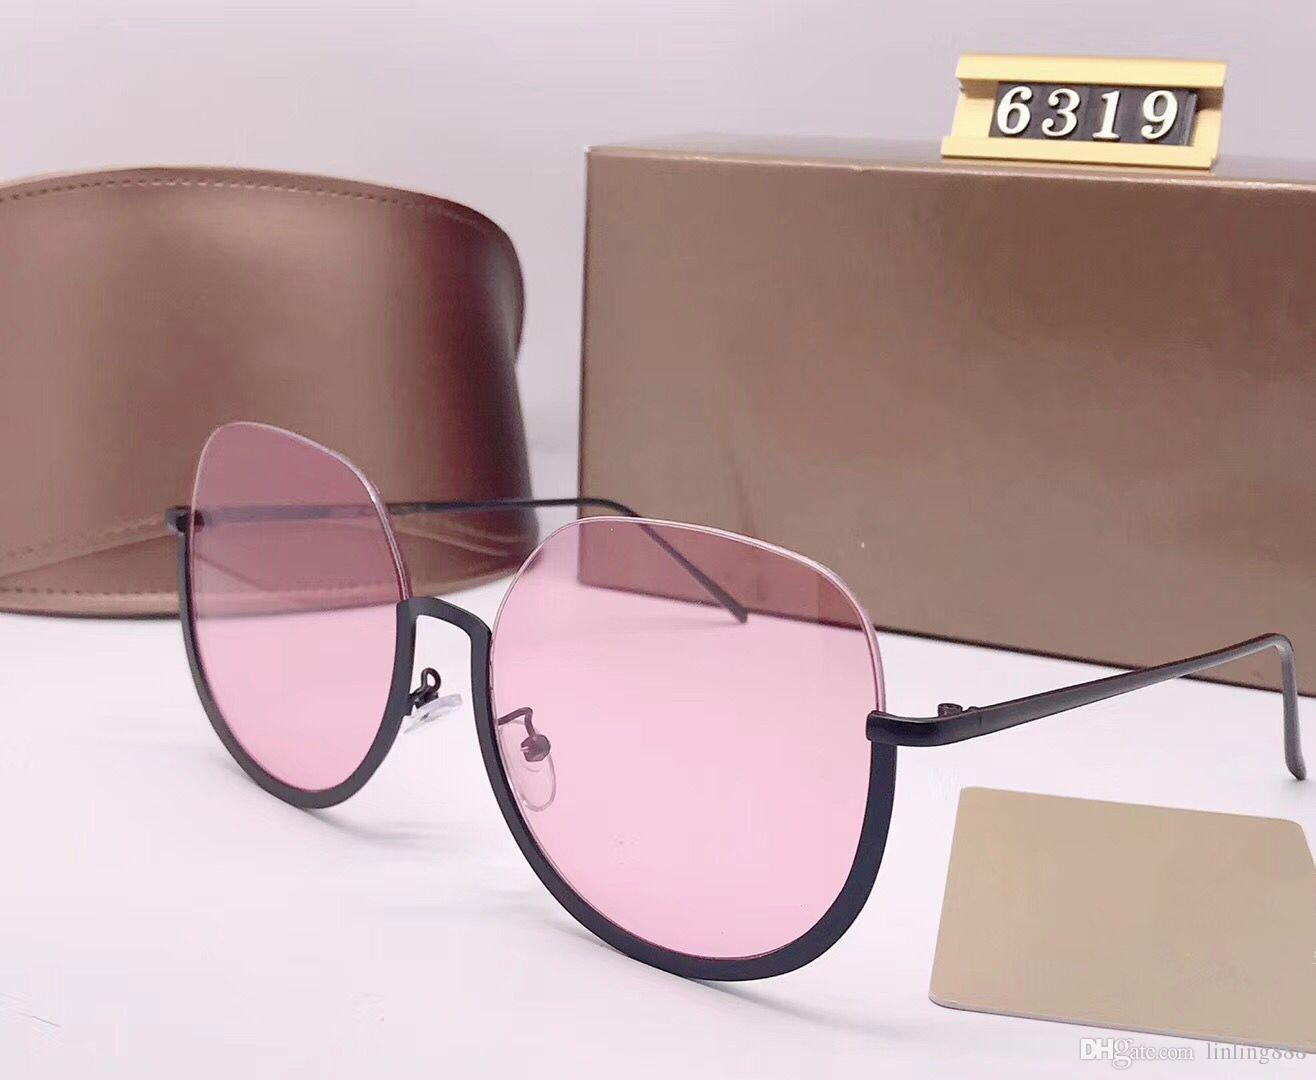 72b8f93c75f Luxury Women Designer Sunglasses 6319 Brand Fashion StyleMixed Color ...